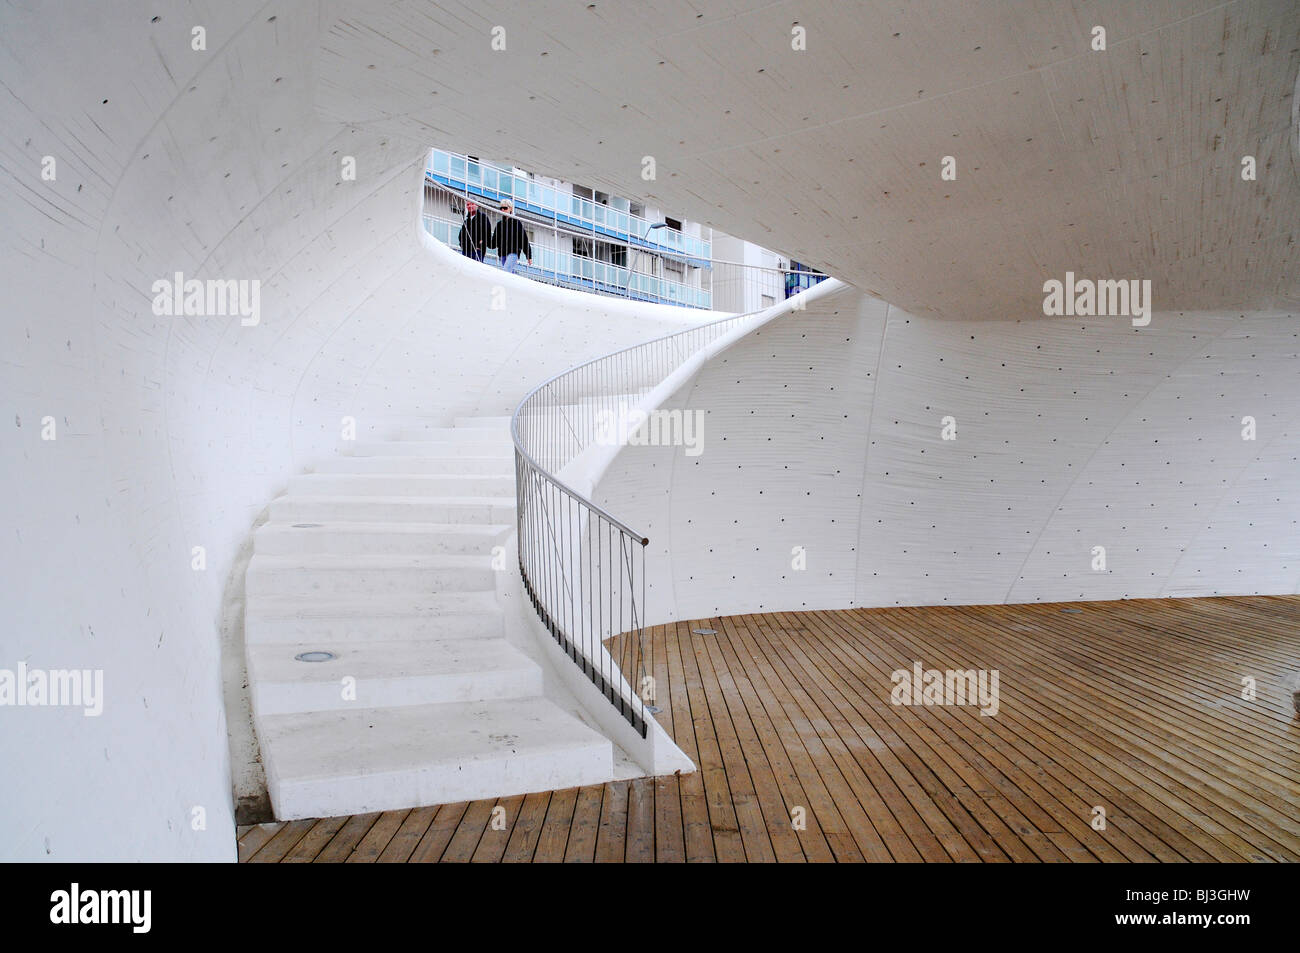 Moderne Architektur, Treppe, Durchgang, promenade, Benidorm, Costa Blanca, Provinz Alicante, Spanien, Europa Stockbild